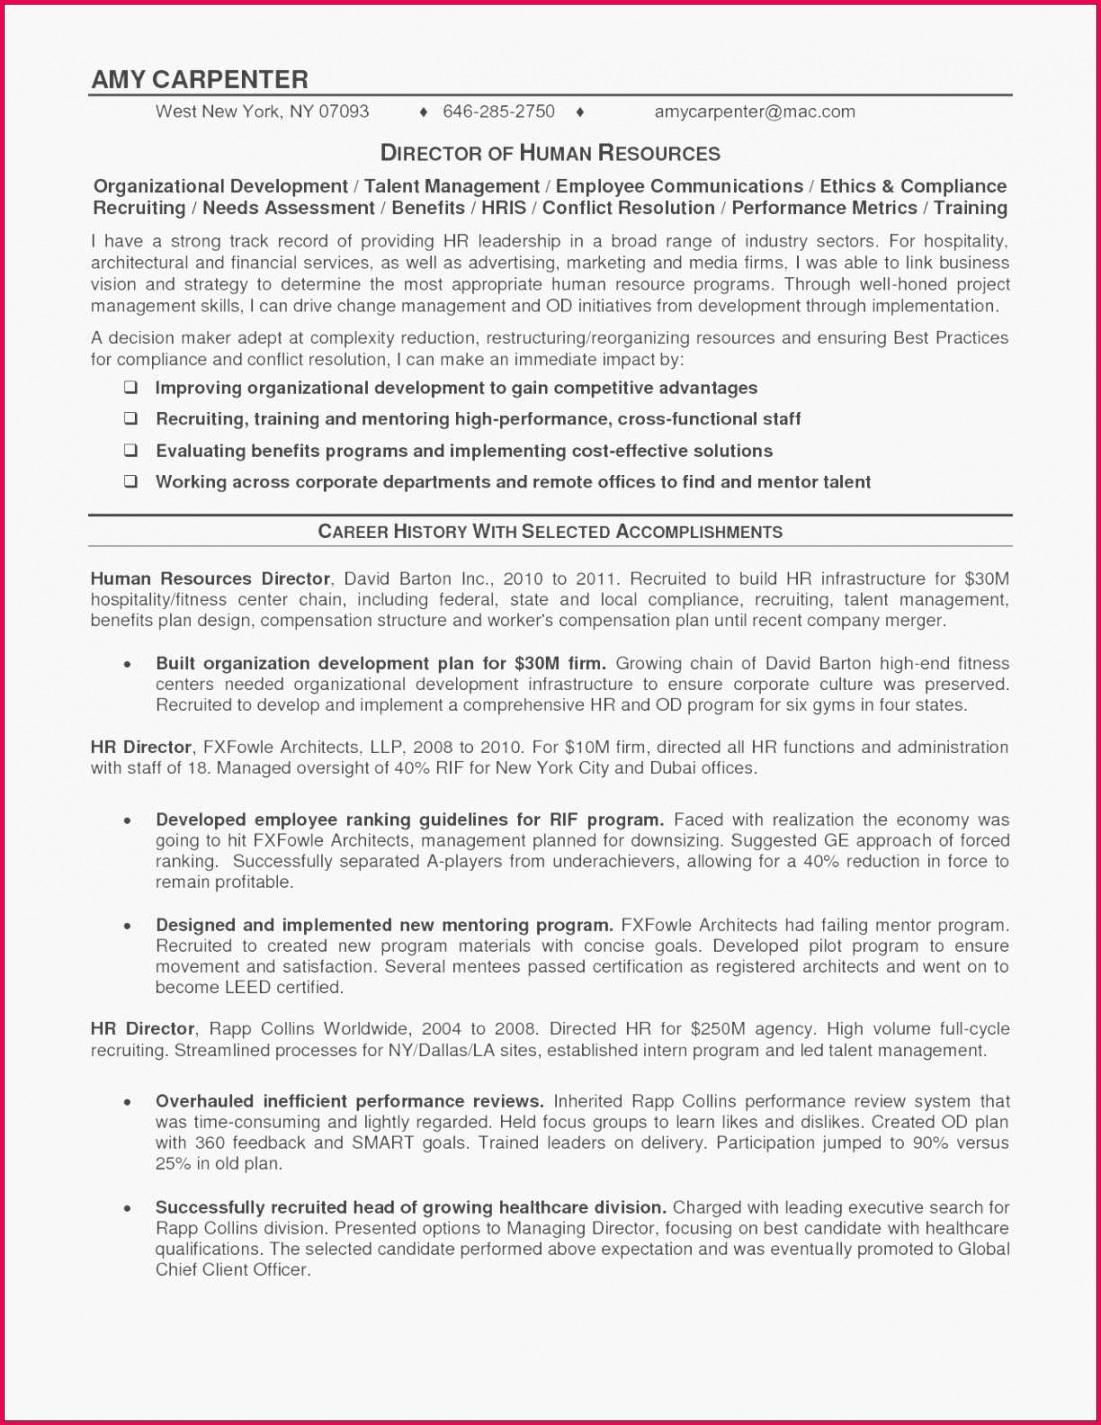 professional cover letter samples free 9 inheritance letter template inspiration letter templates of professional cover letter samples